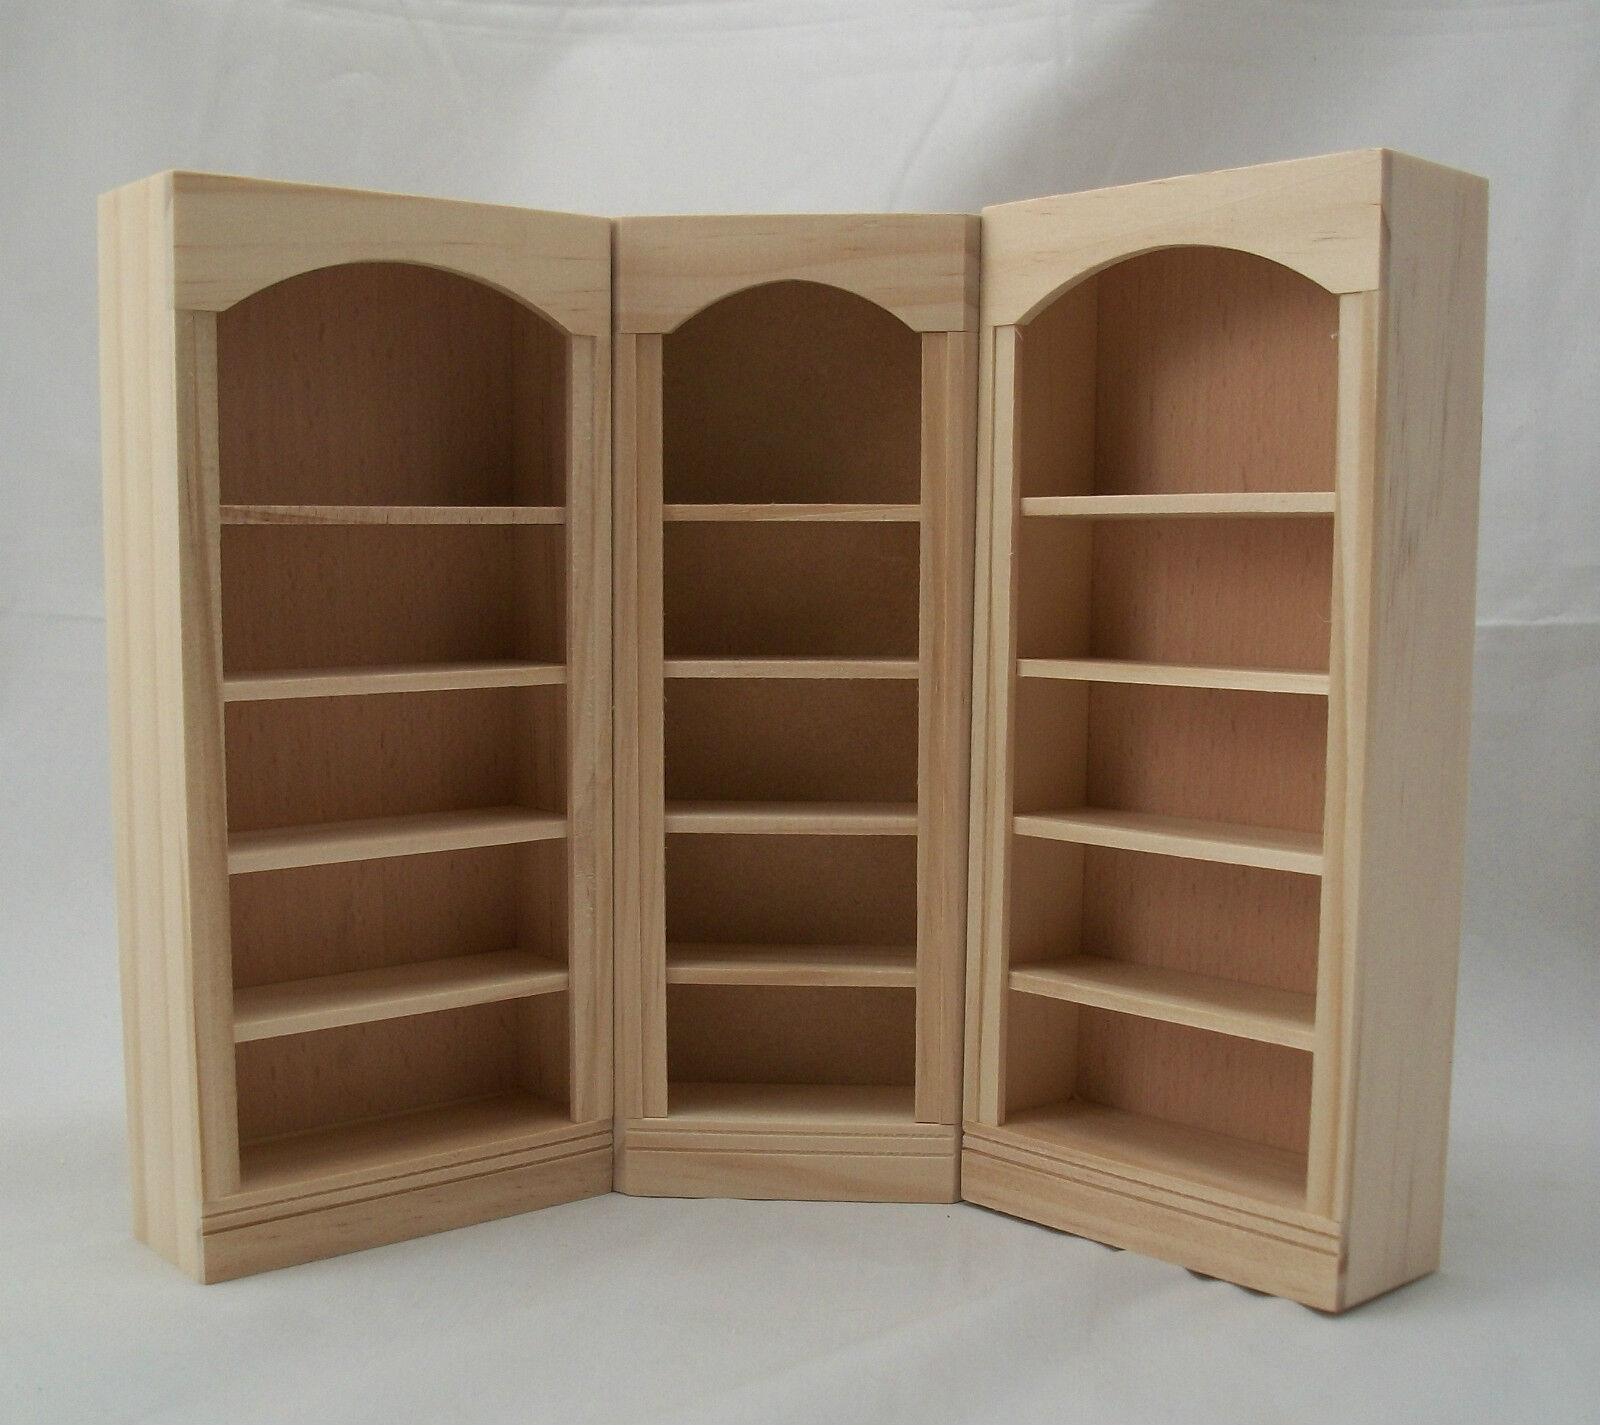 Corner Bookcase 5026 Dollhouse Miniature 1 12 Scale